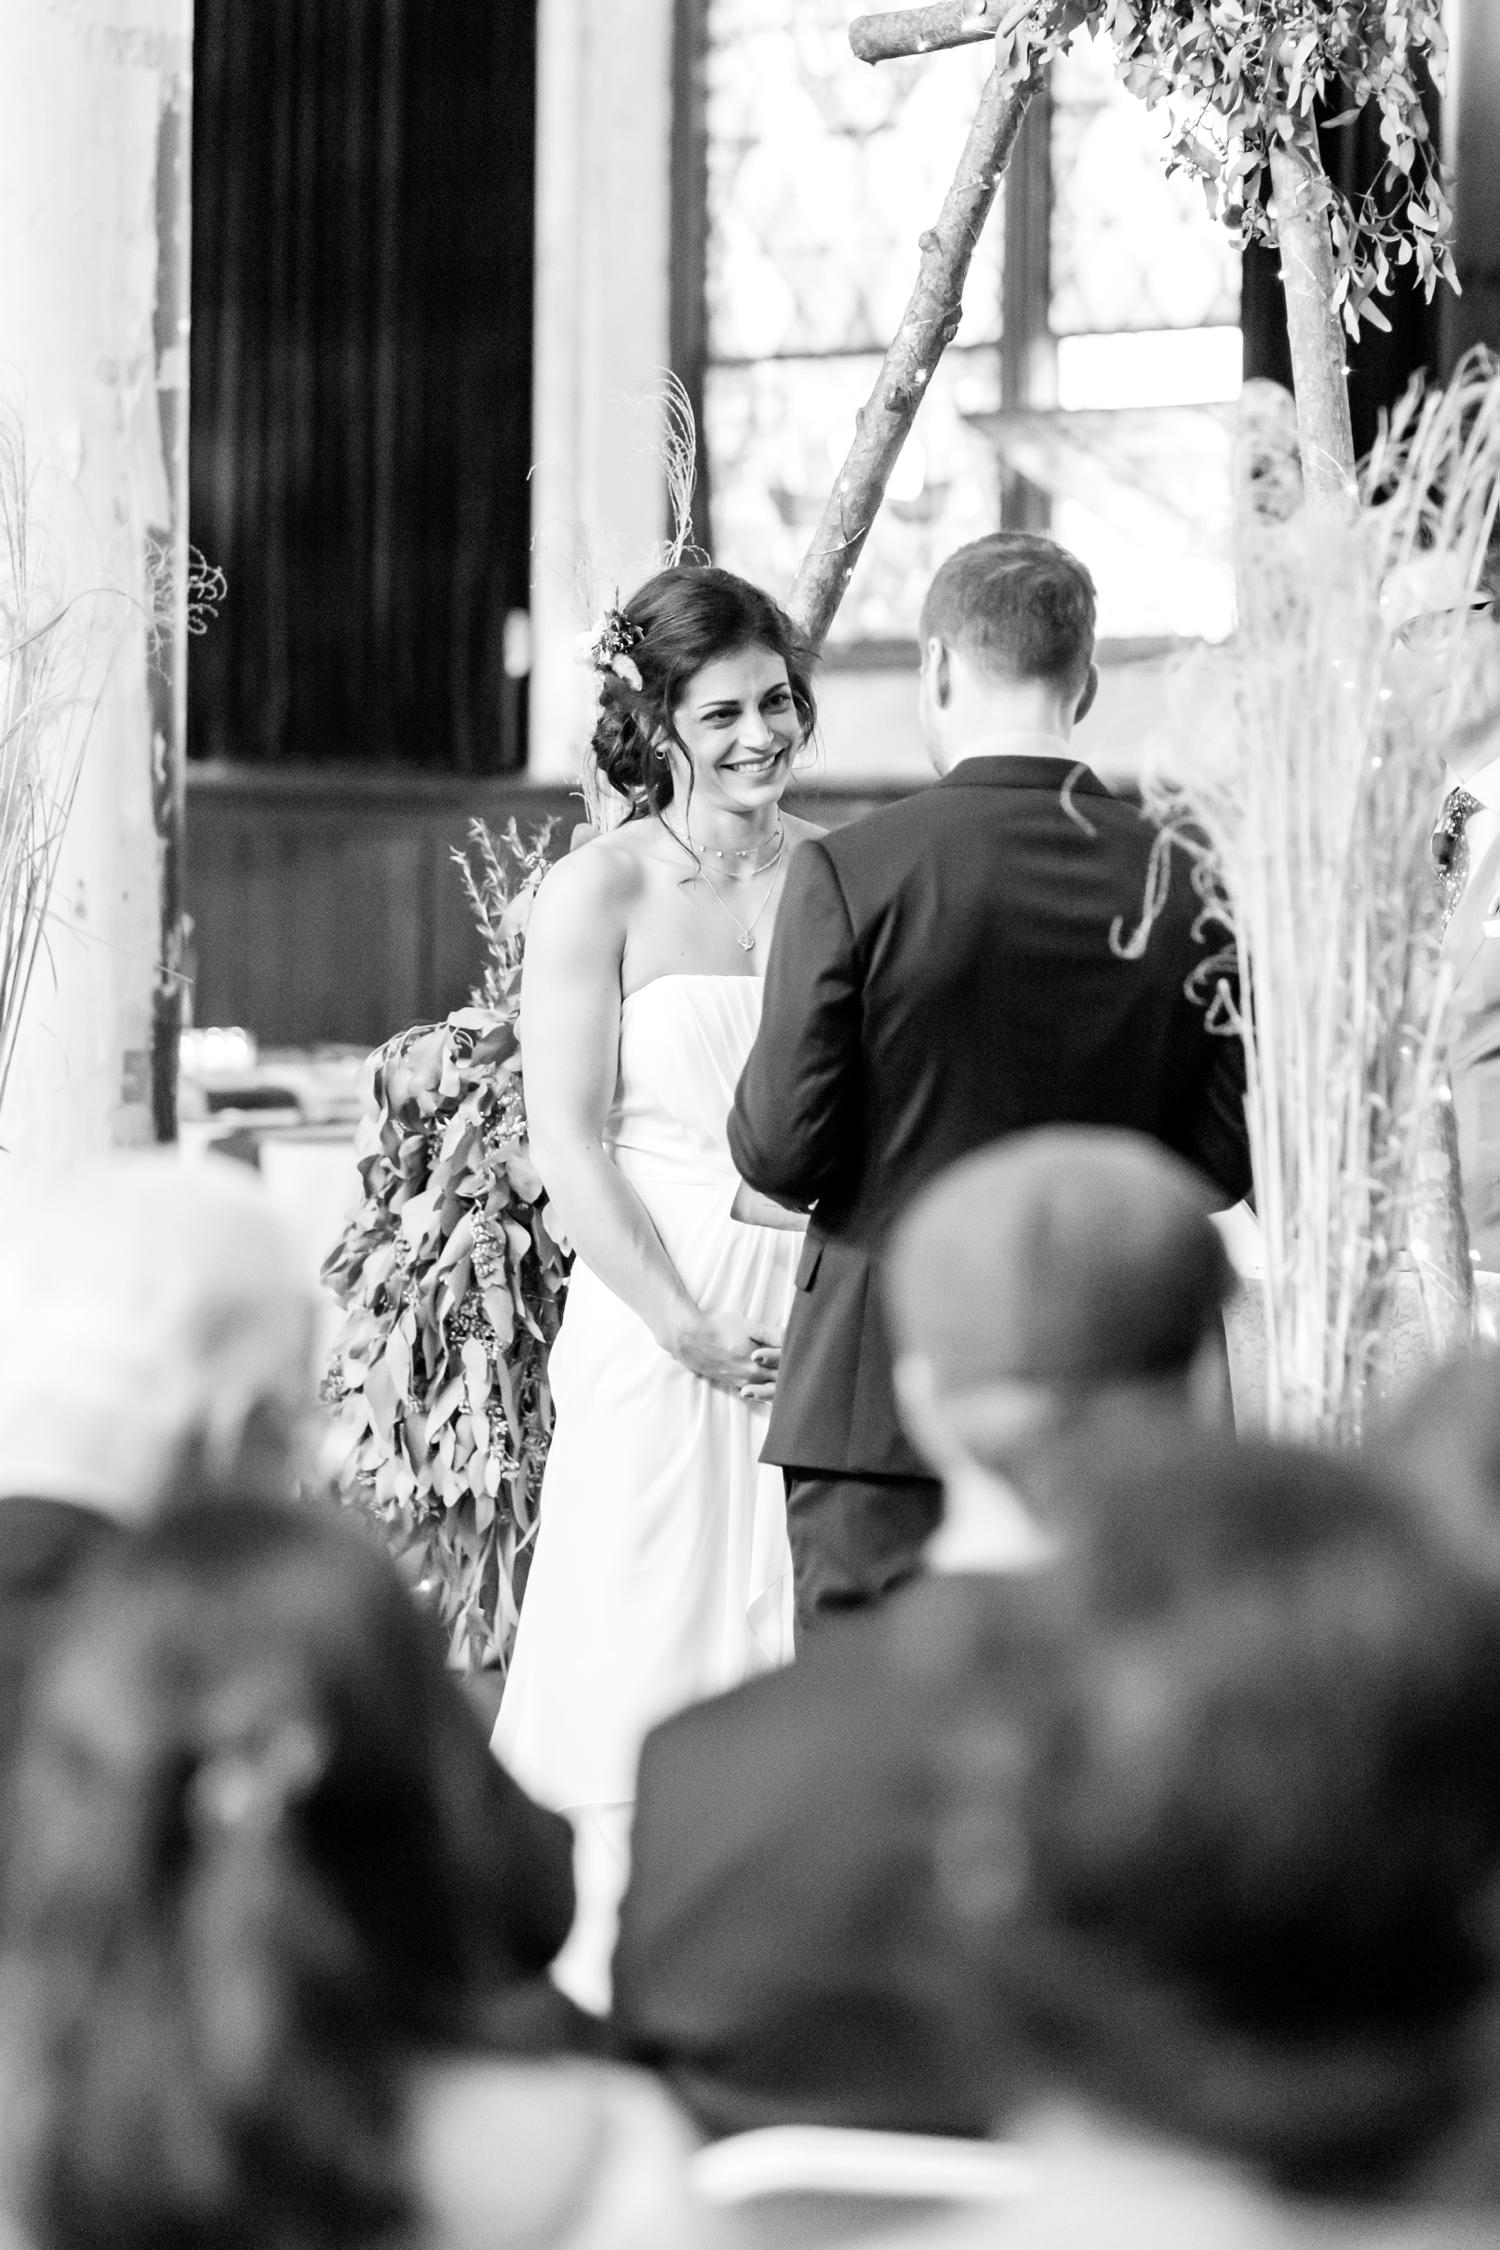 Matt & Angel Skarzynski Wedding WEDDING HIGHLIGHTS-113_2640-Space-wedding-Baltimore-Maryland-wedding-photographer-Patapsco-State-Park-engagement-anna-grace-photography-photo.jpg